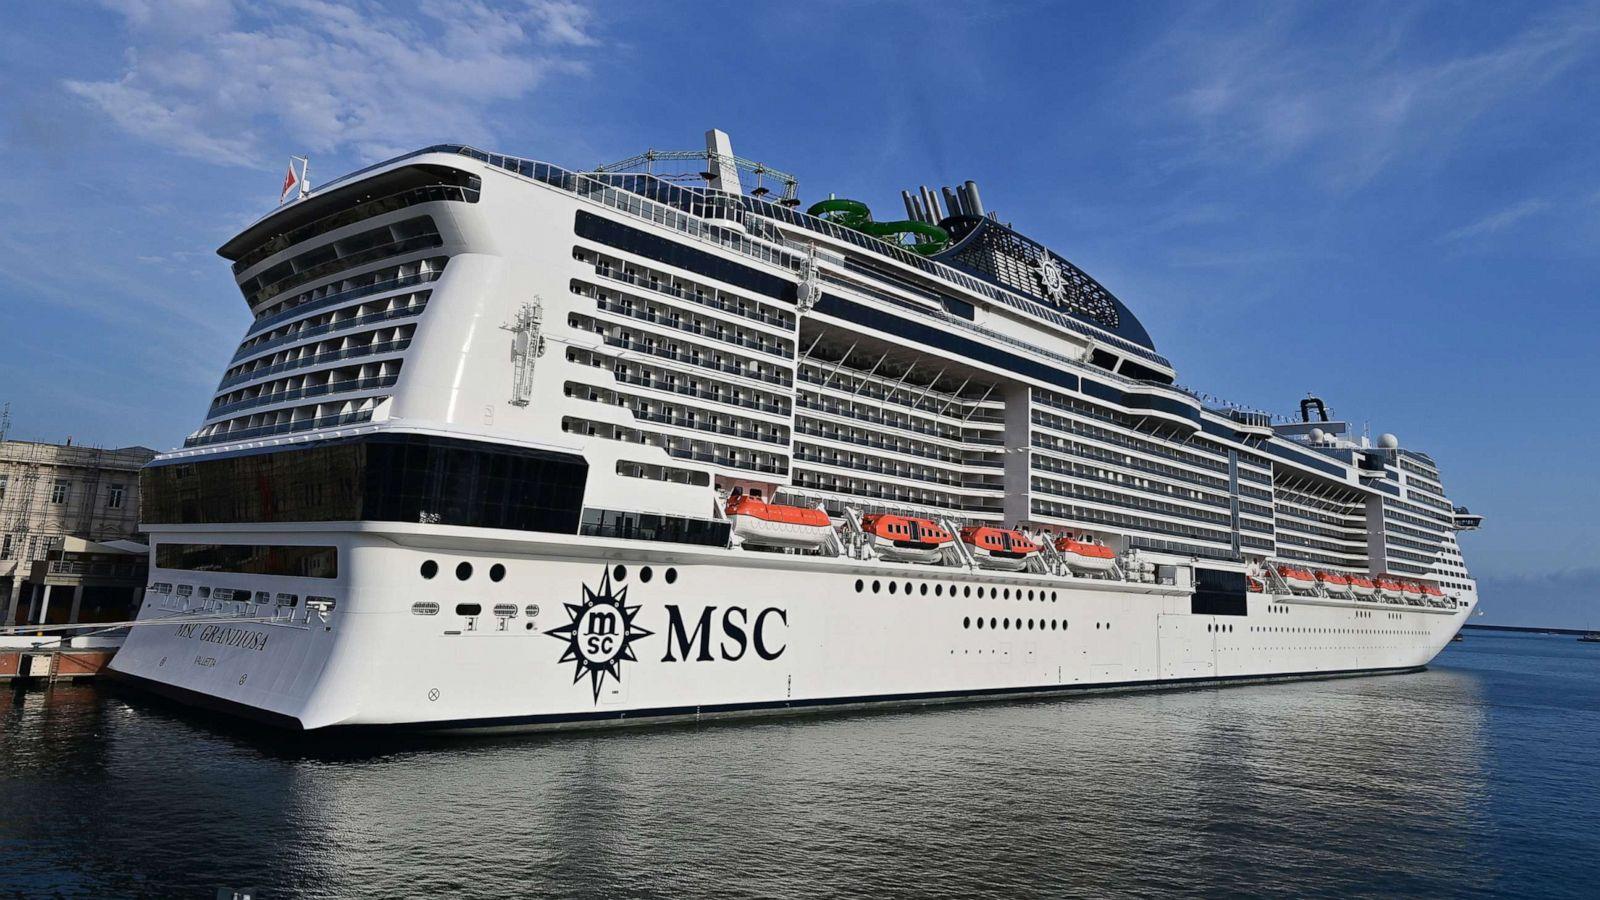 Show ship reality cruise Below Deck